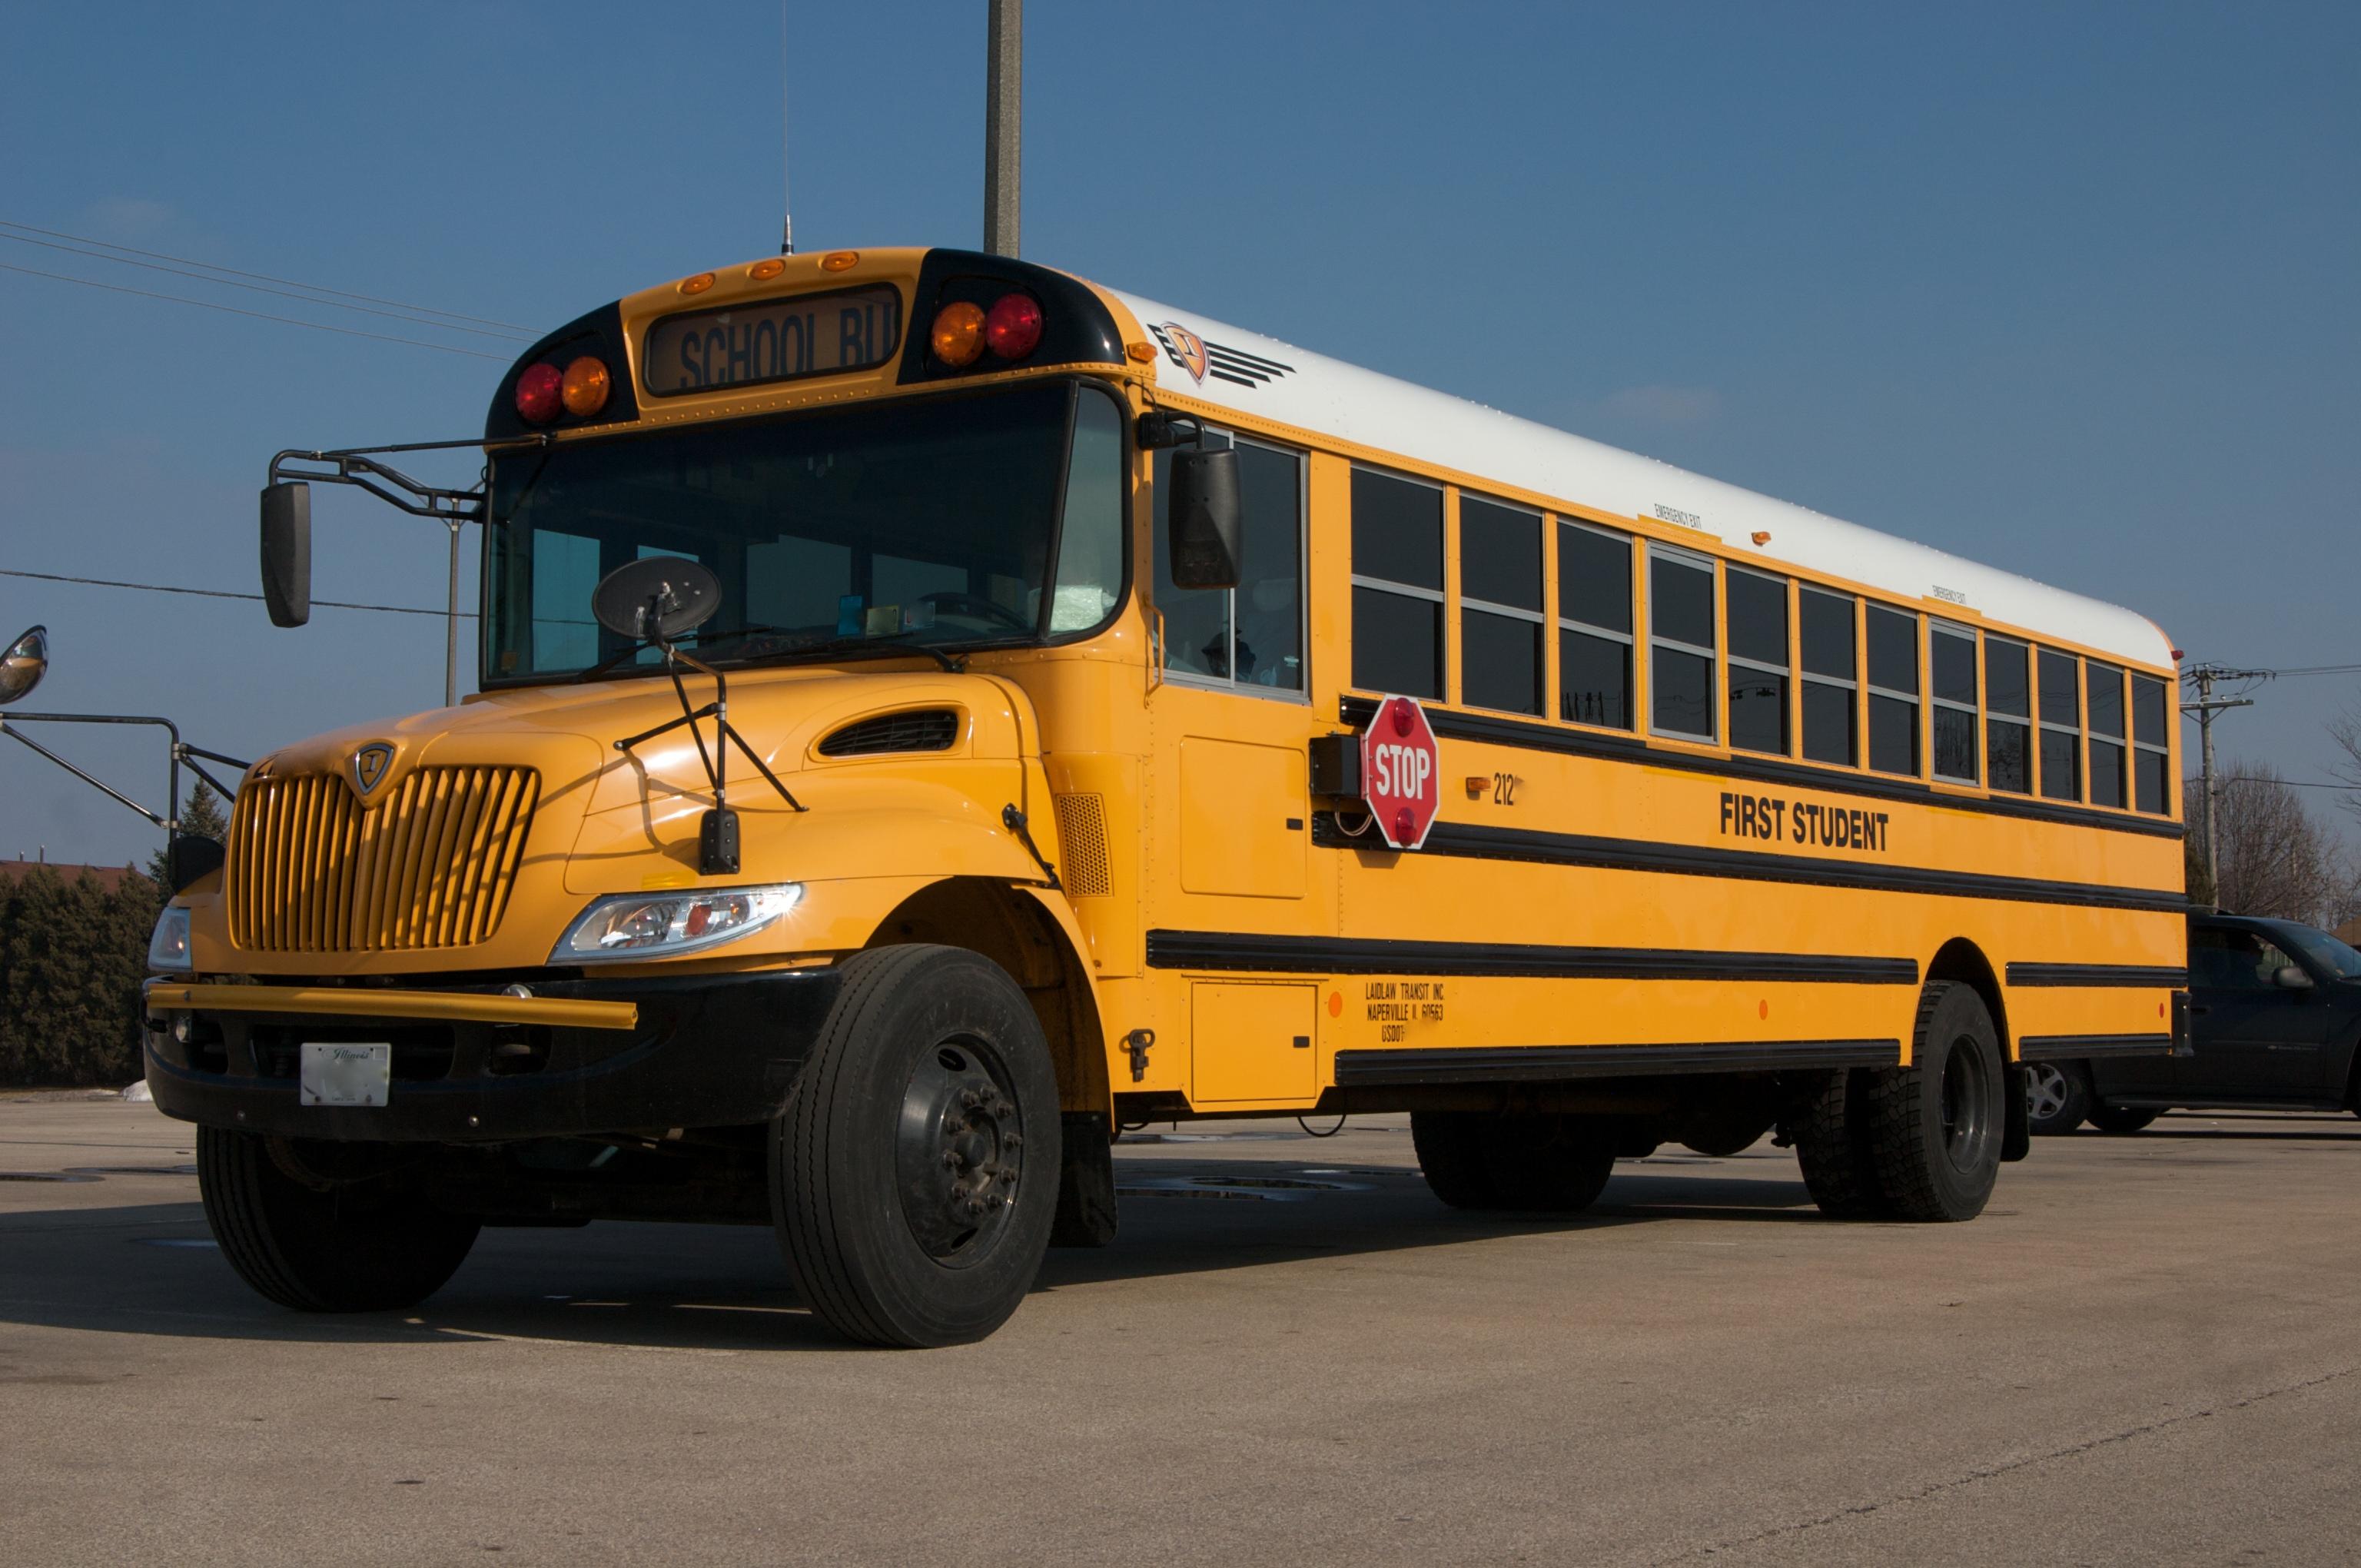 Description ICCE Illinois School Busjpg 3072x2040